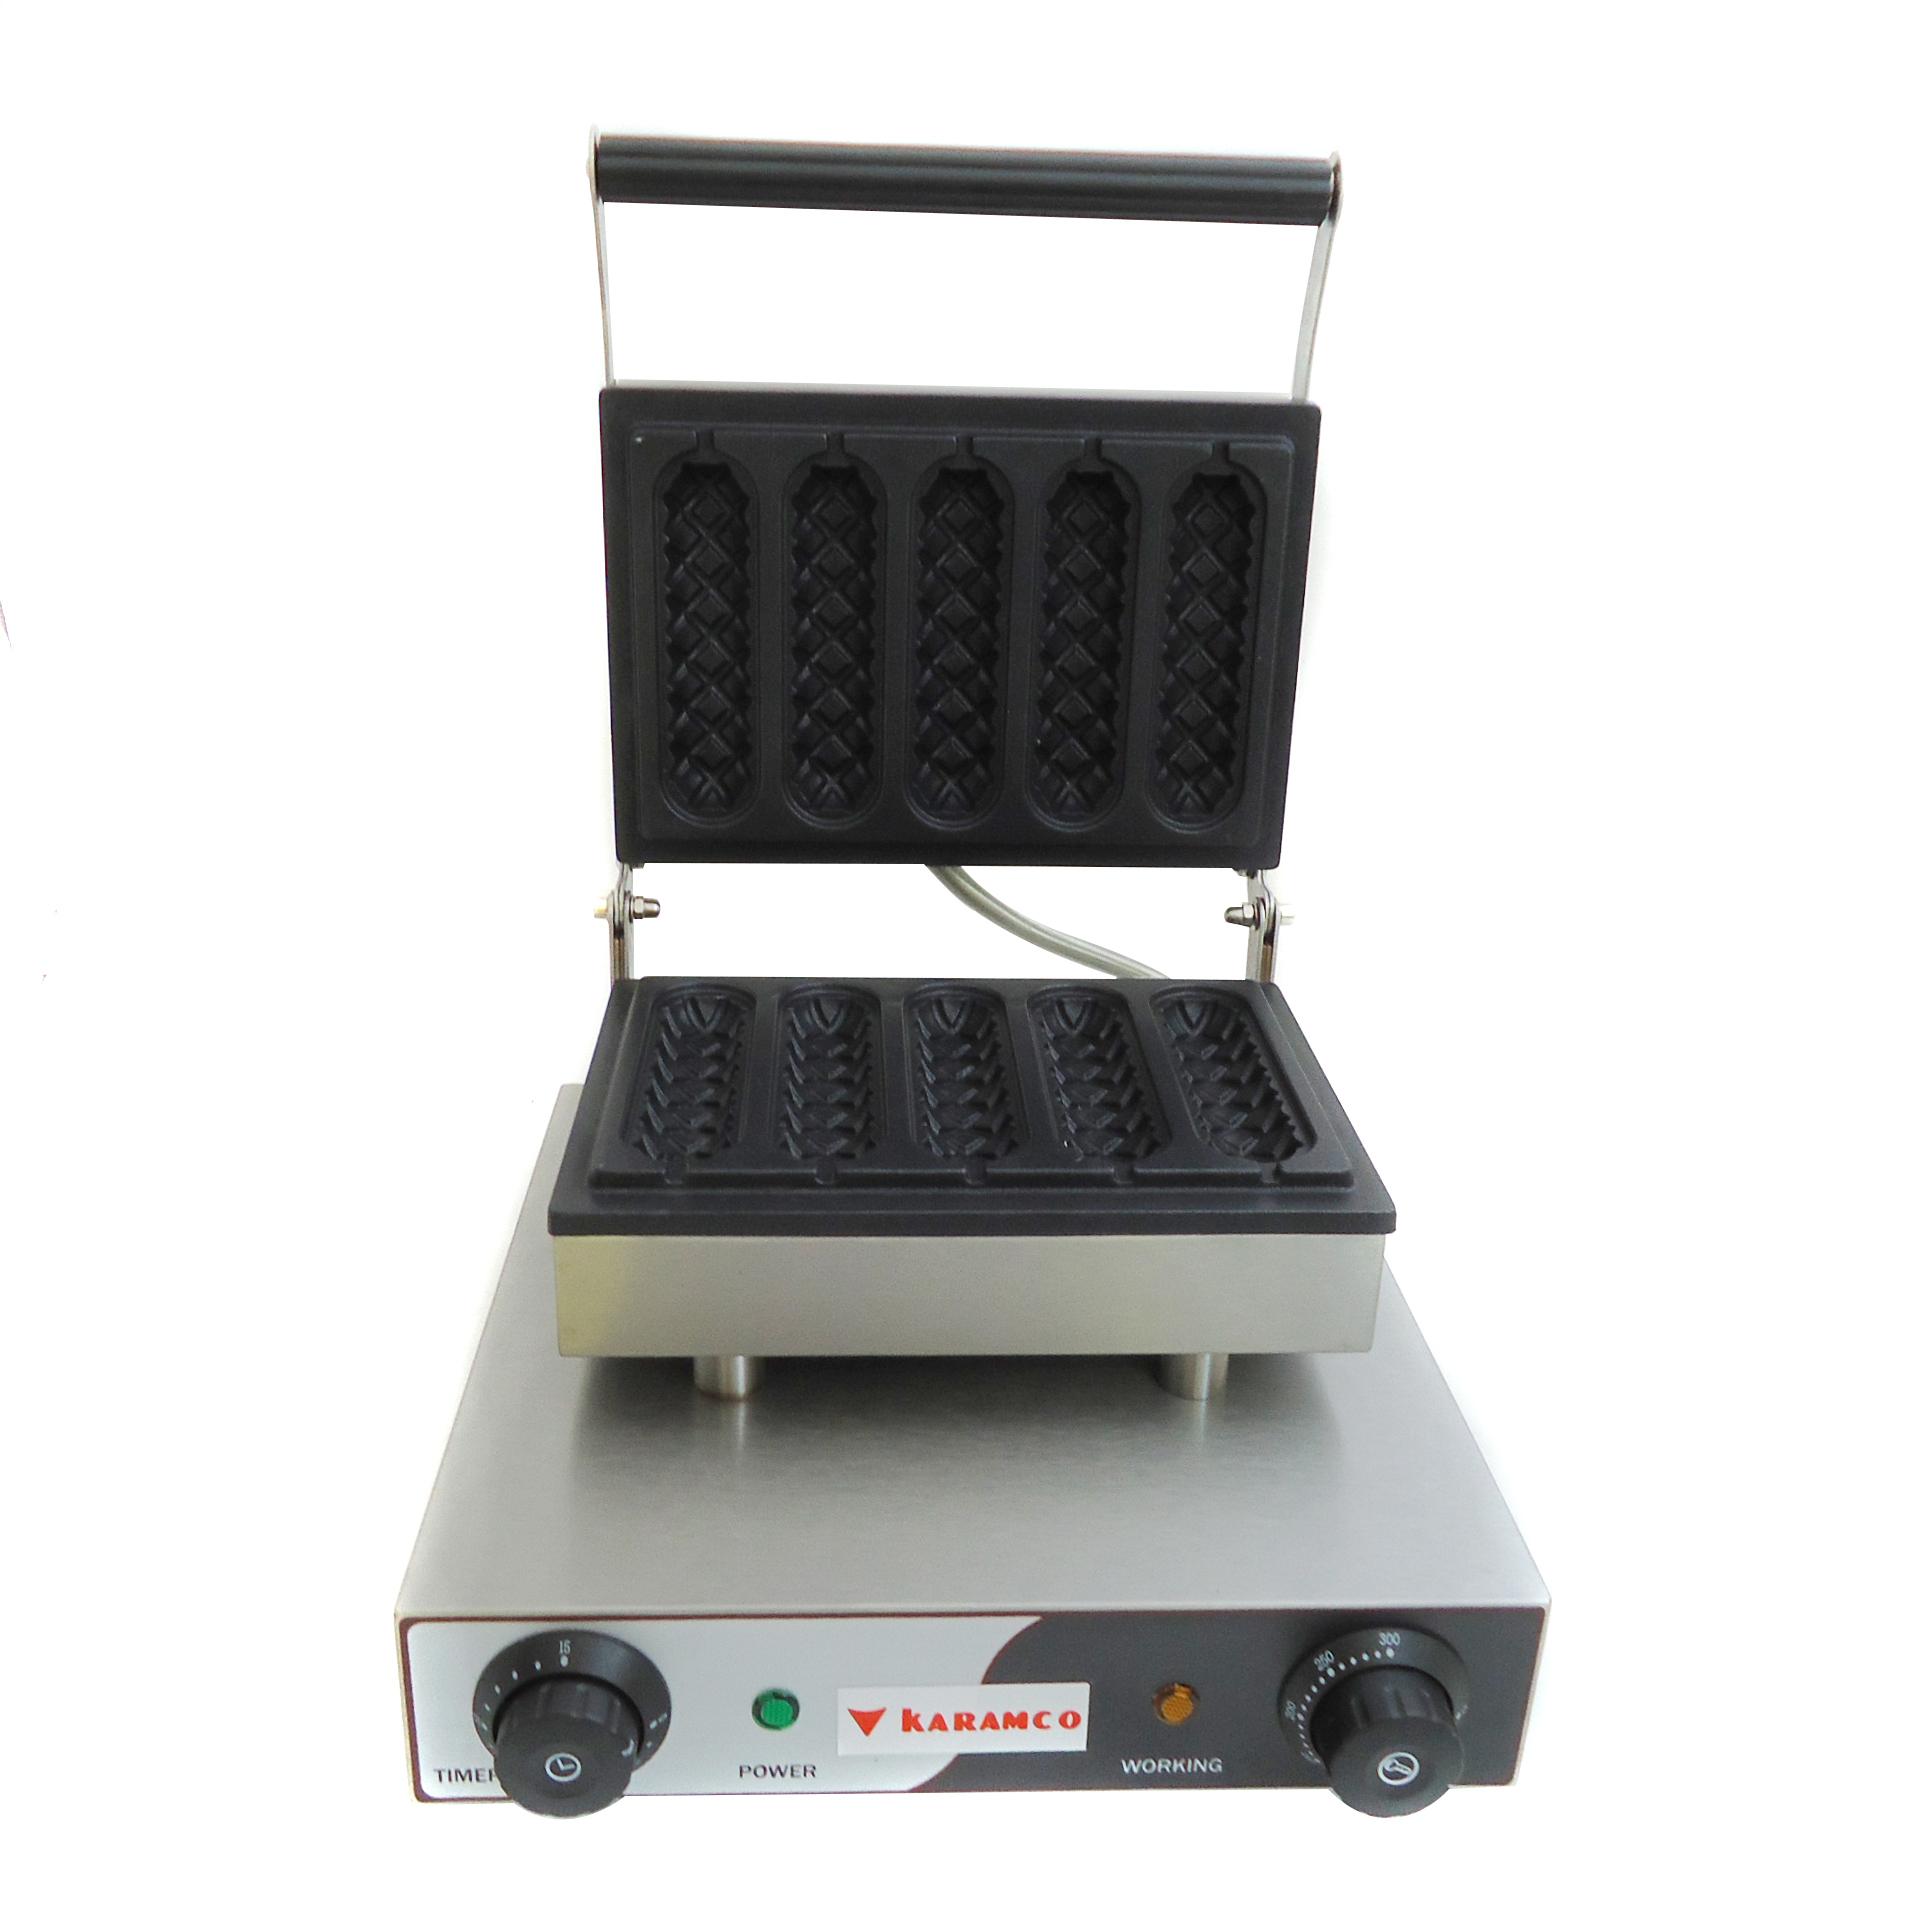 WB15 Βαφλιέρα Συσκευή για Βάφλες Μονή για Βάφλα Μπαγκέτα - Διαστάσεις Πλάκας: 27 επαγγελματικός εξοπλισμός   φούρνοι μικροκύματα κρεπιέρες βαφλιέρες φριτέζες  επ